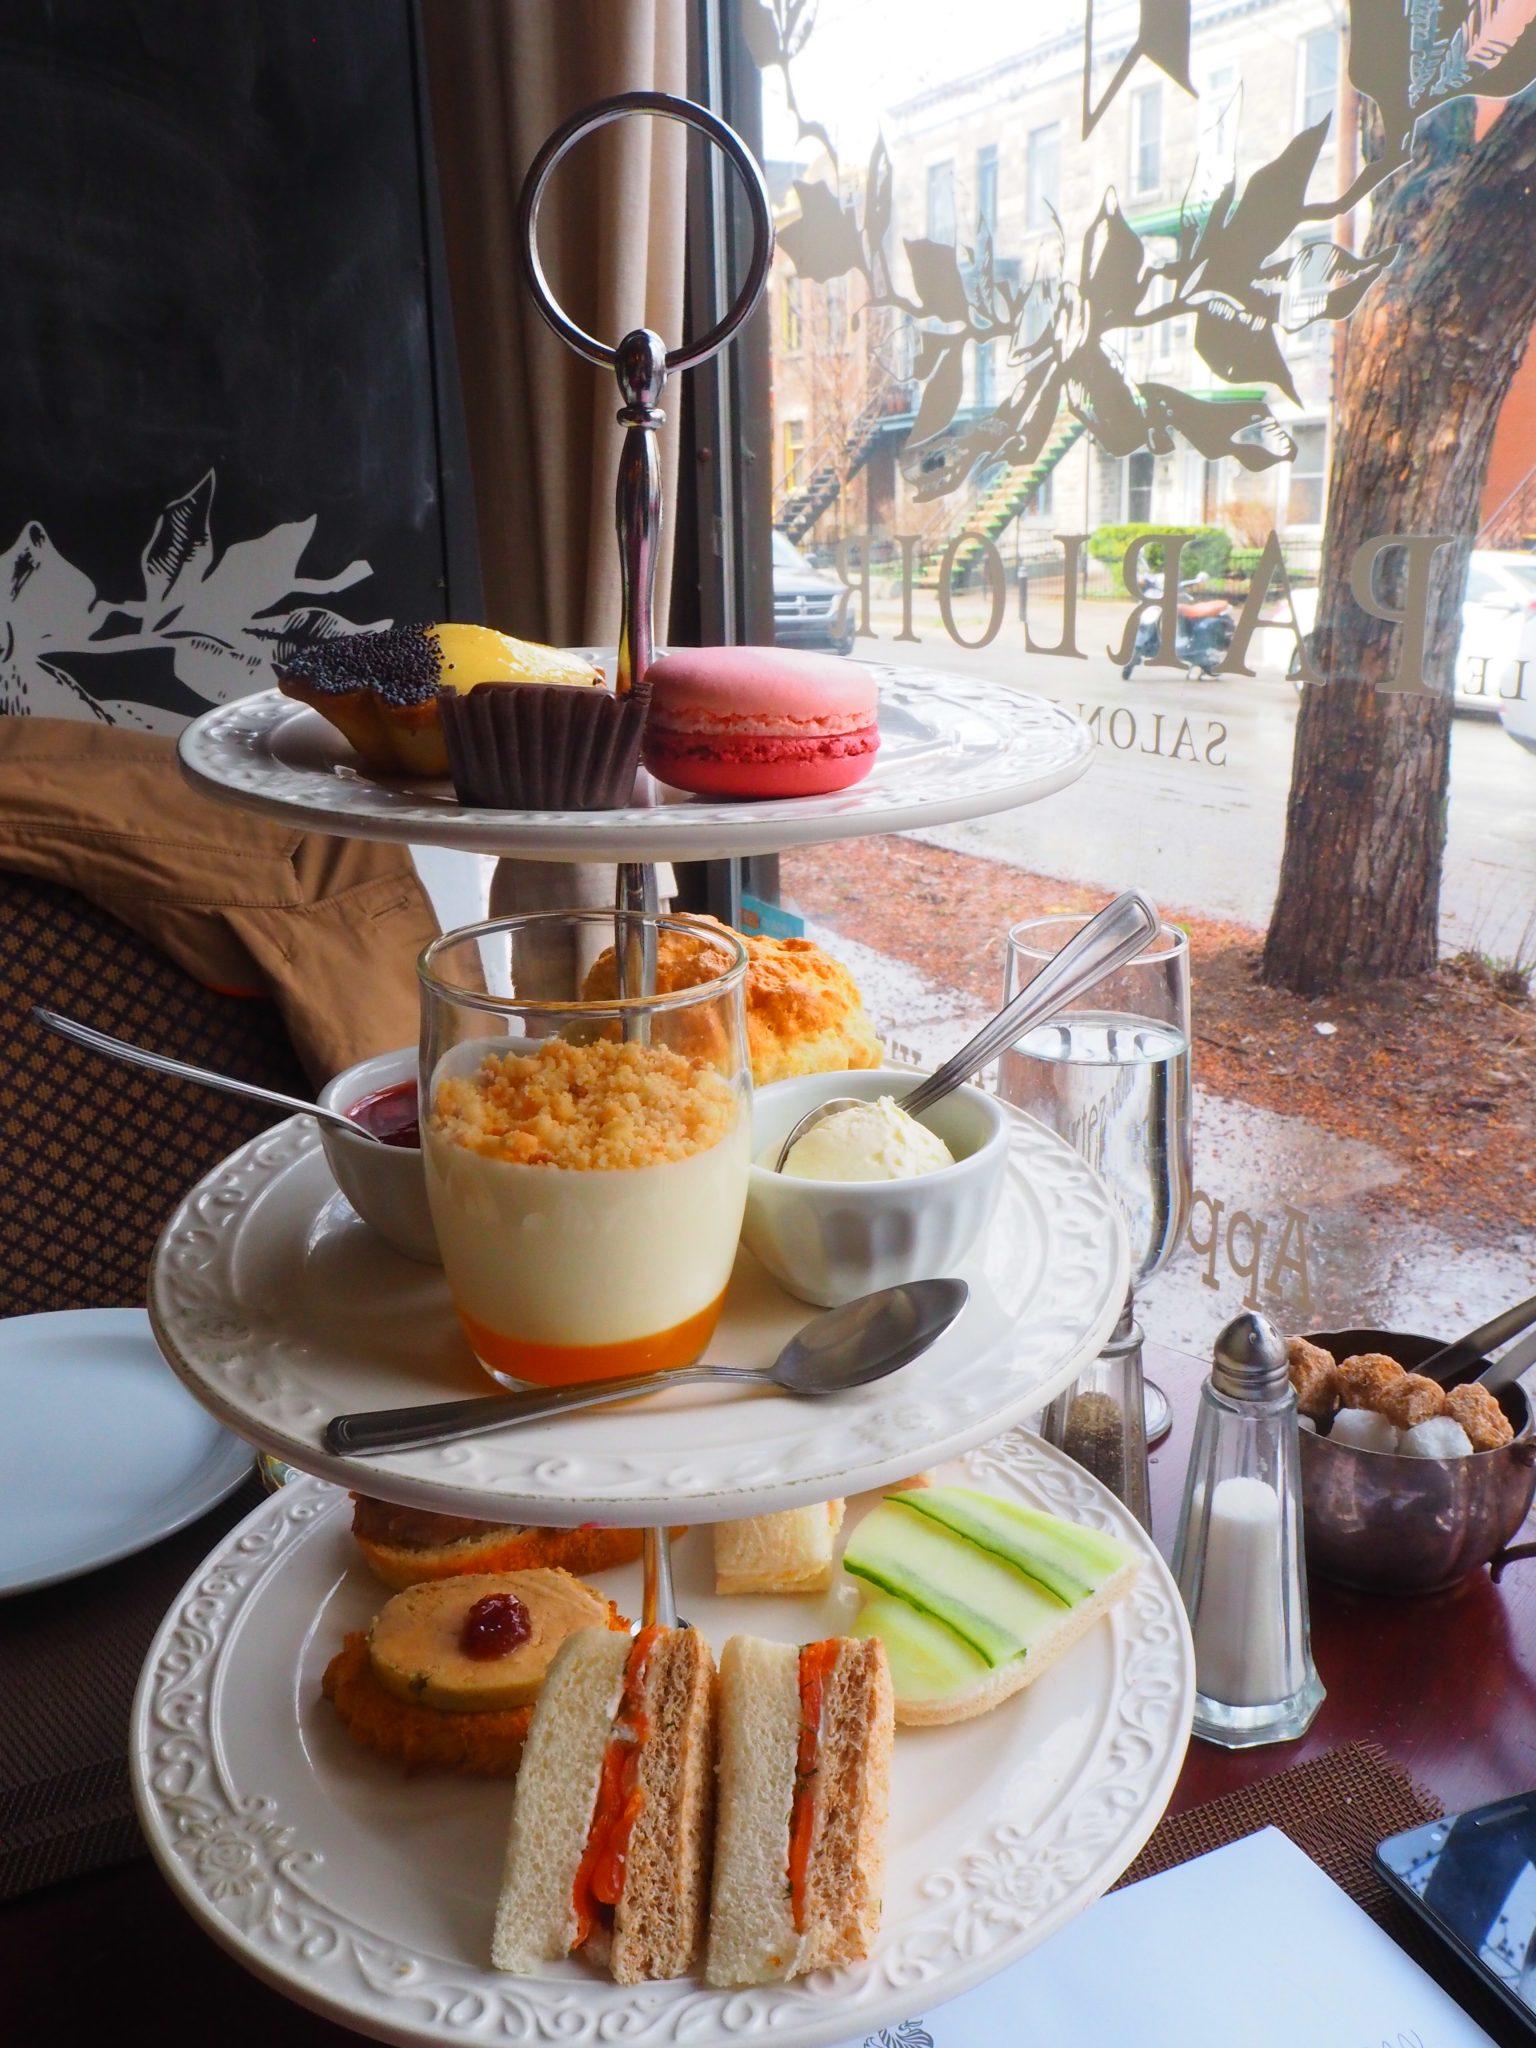 Afternoon Tea at Le Parloir tea room / Afternoon Tea au Salon de Thé Le Parloir